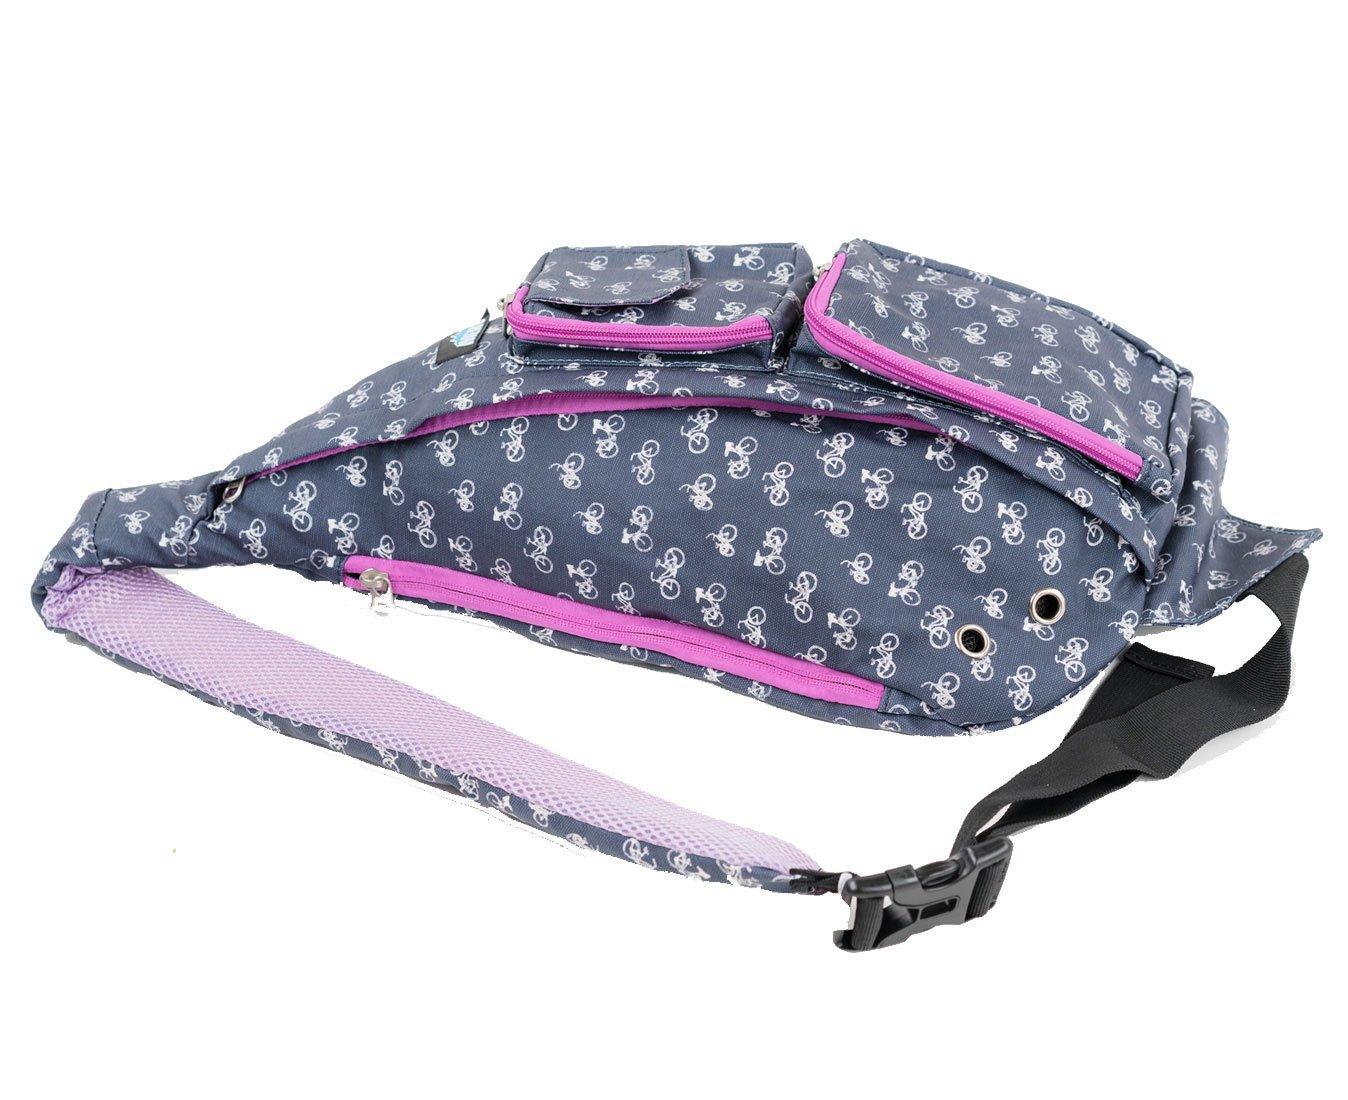 e8ee67f258e5 Meru Sling Backpack Bag - Small Single Strap Crossbody Pack for Women and  Men (Bike) - sling-backpack-rope-bag-bike   Casual Daypacks   Clothing